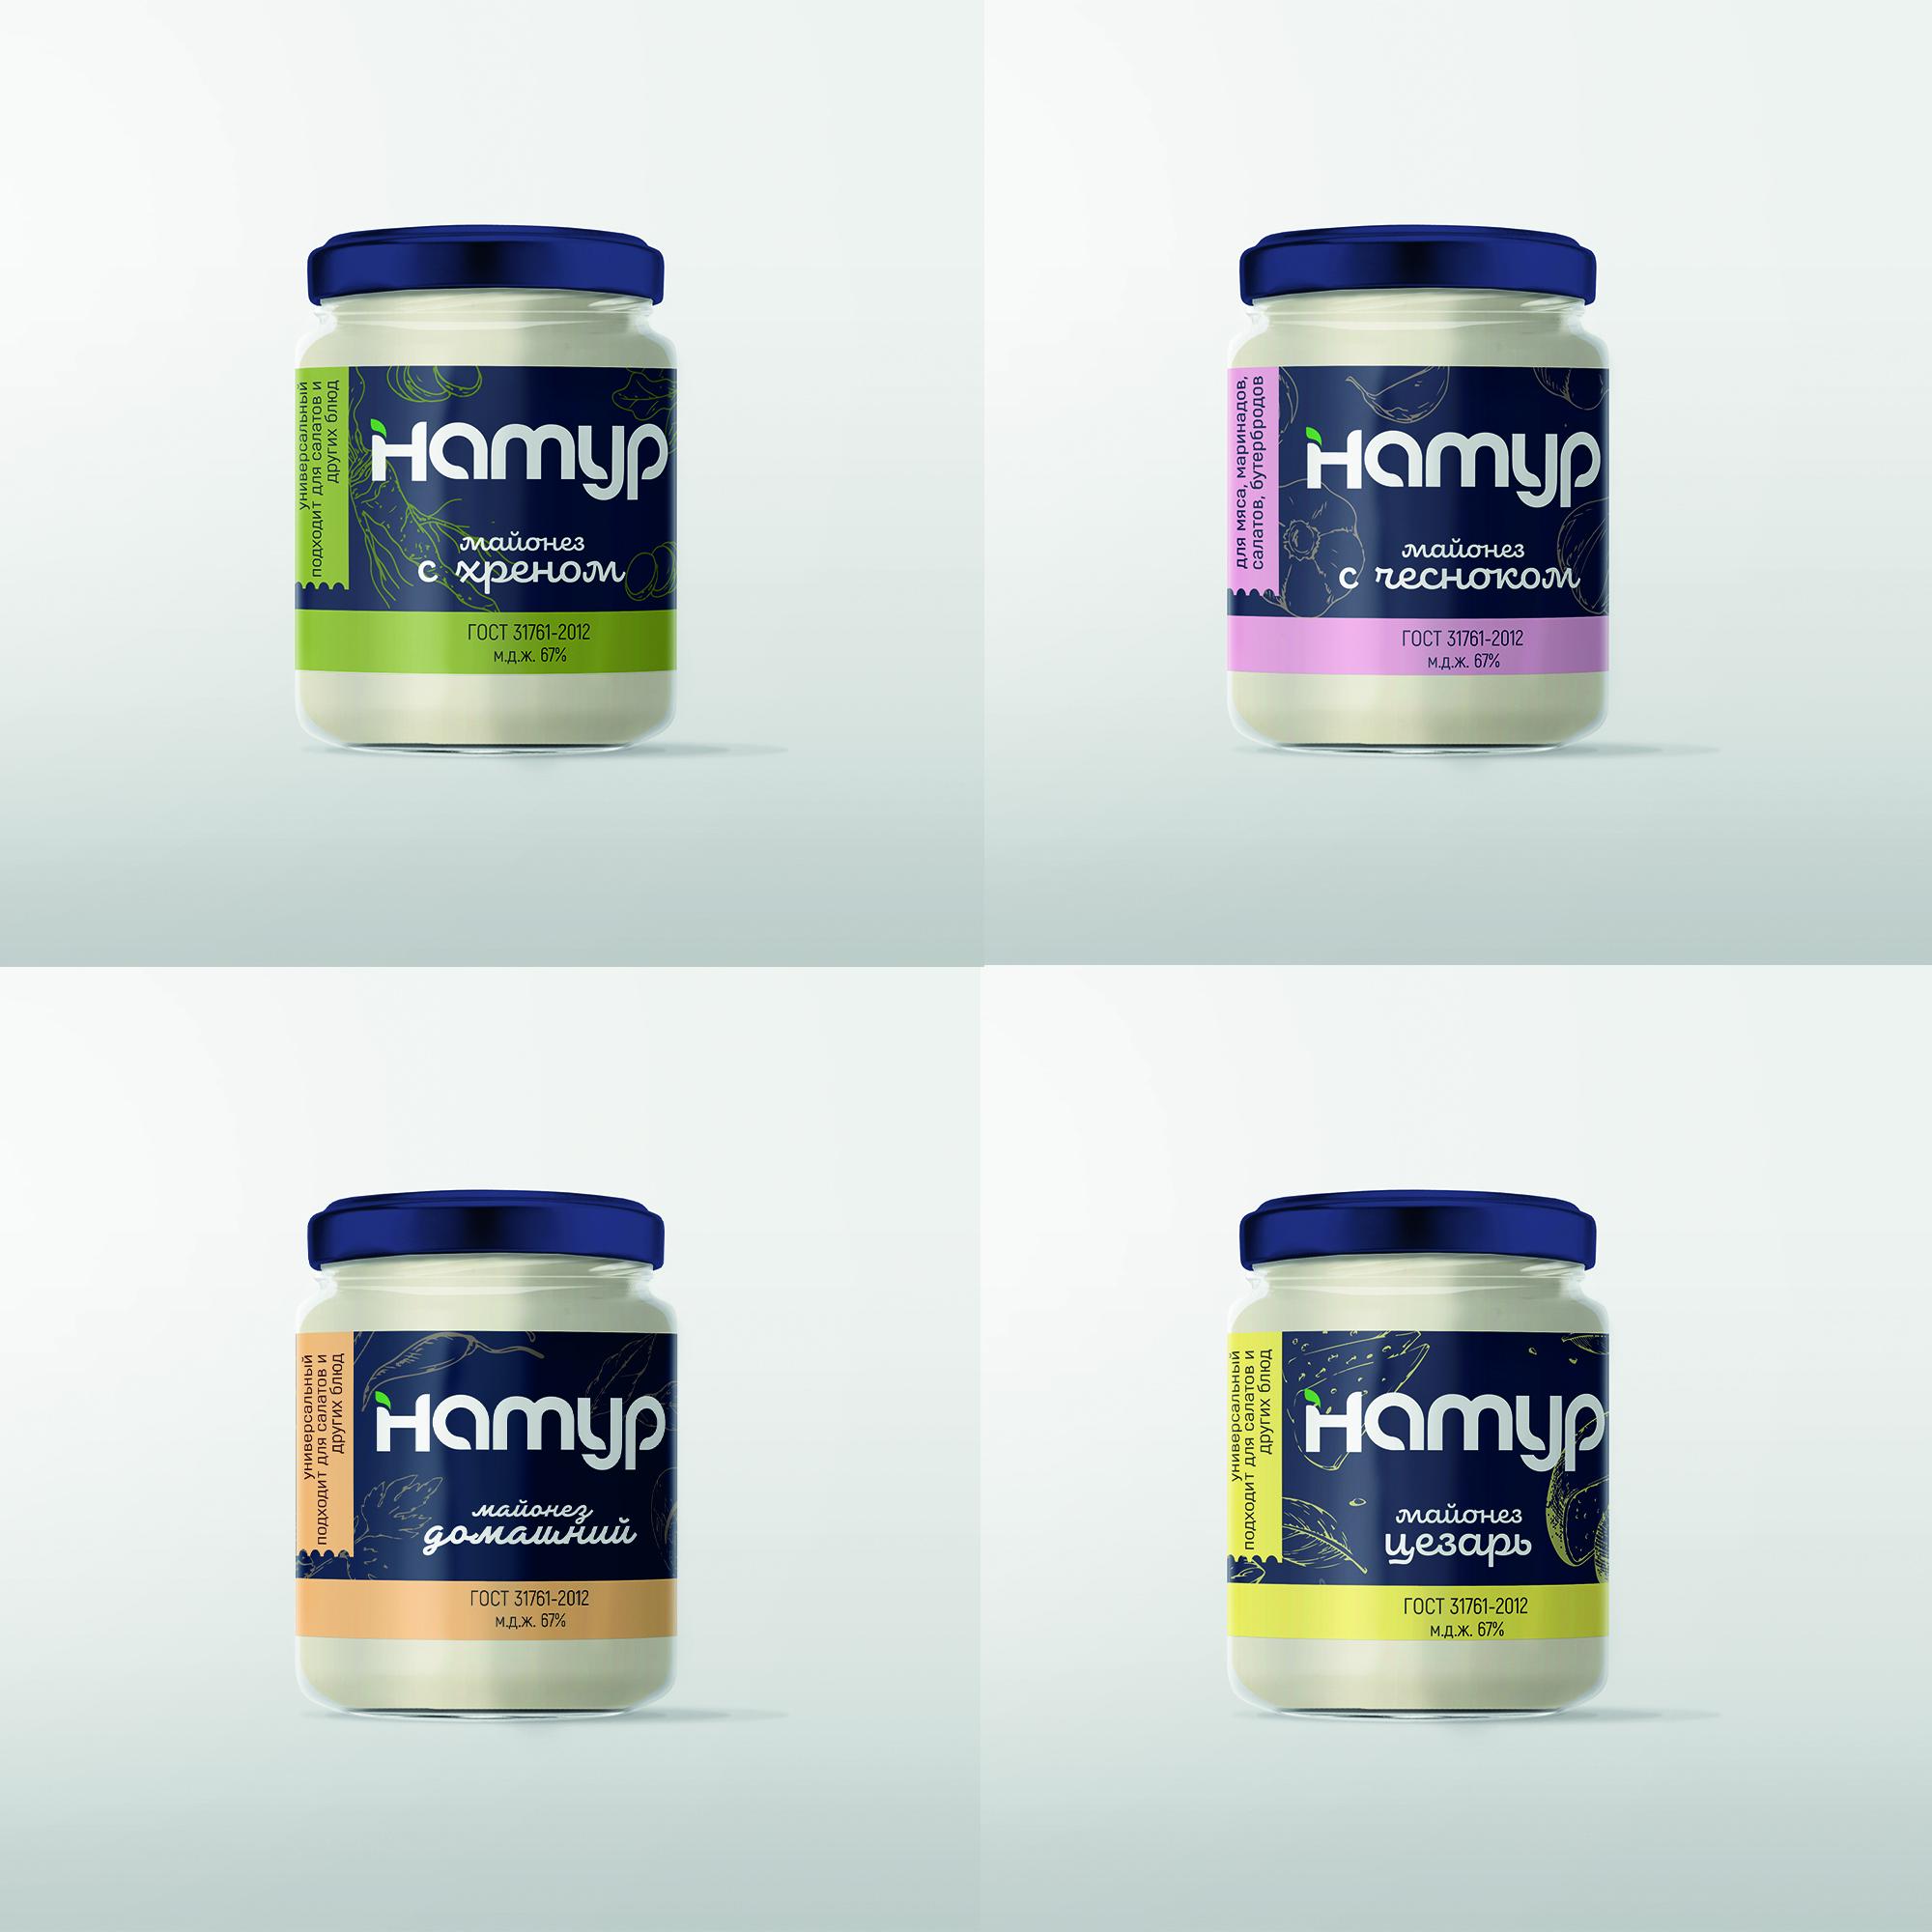 Редизайн упаковки, логотипа